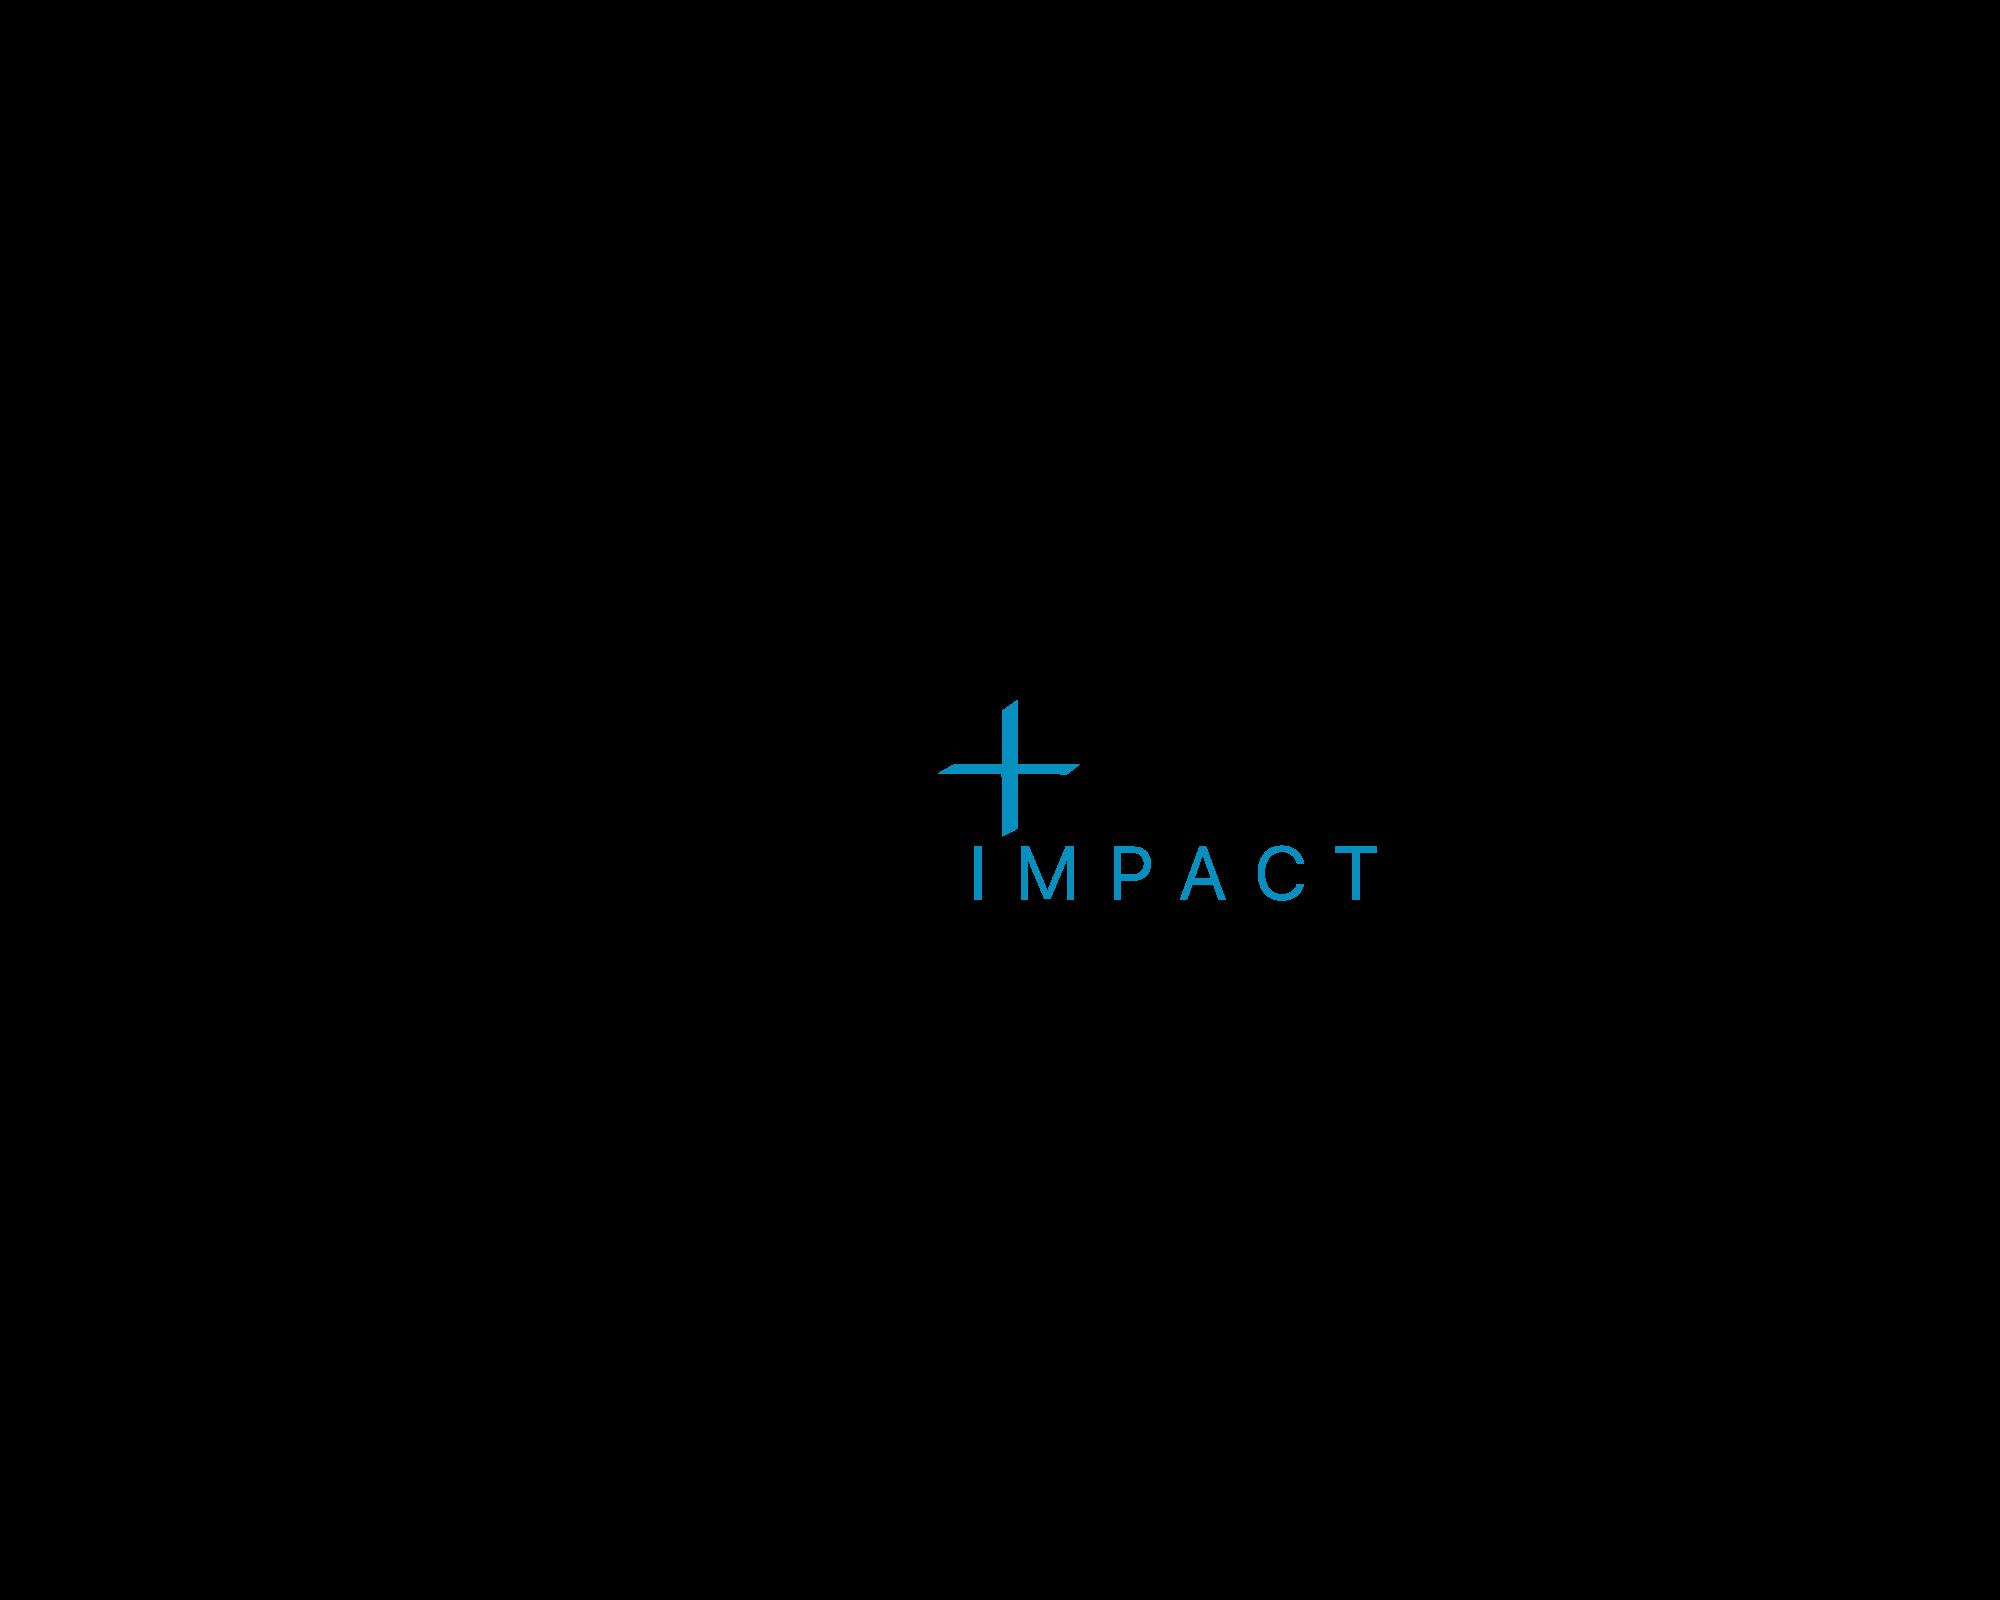 Positive Impact logo